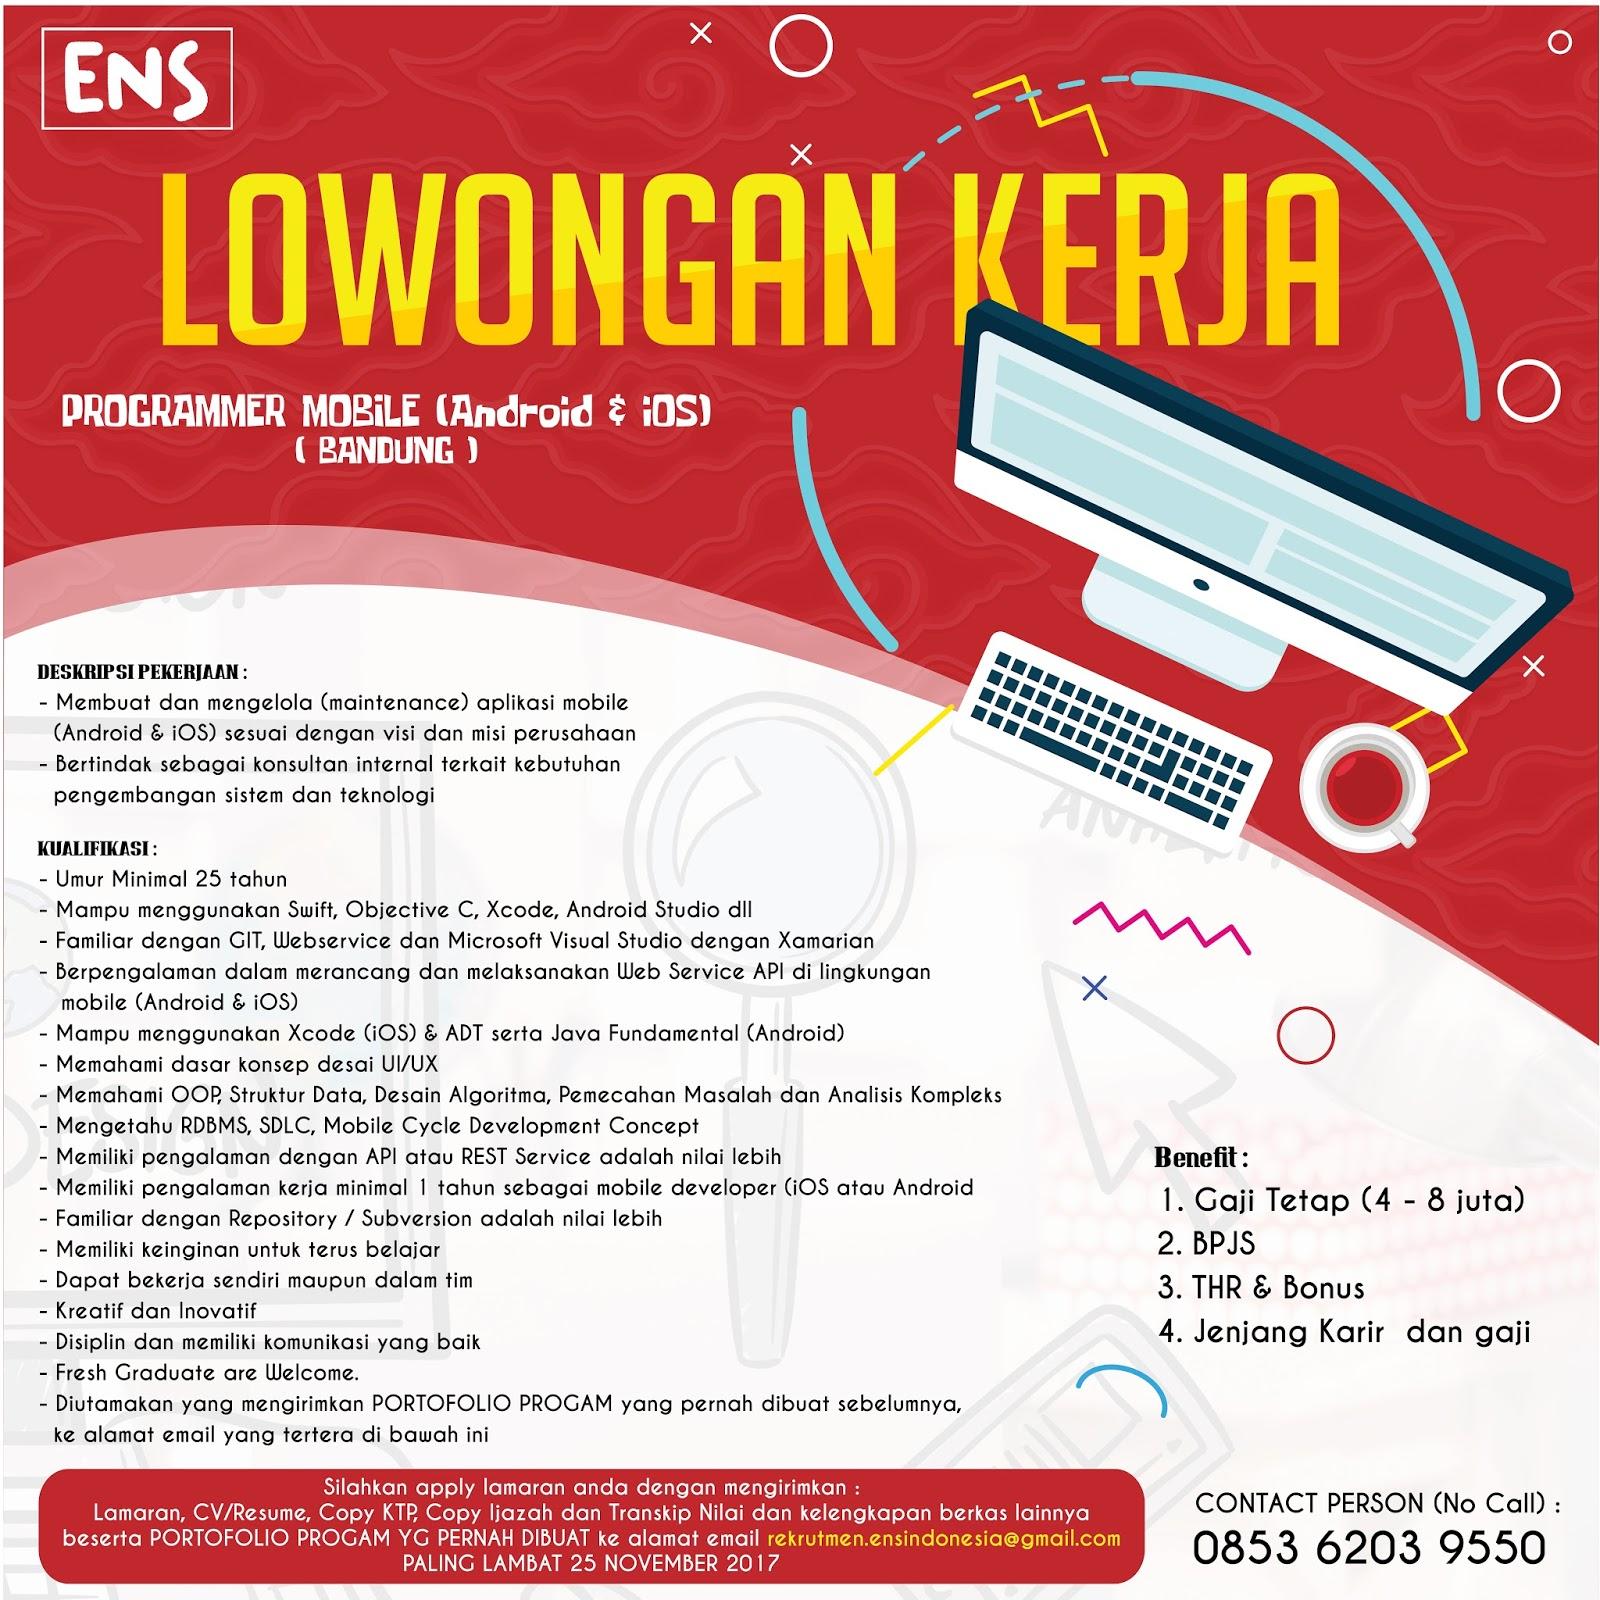 Lowongan Kerja Programmer Mobile Android & IOS ( Bandung ) ENS Indonesia November 2017